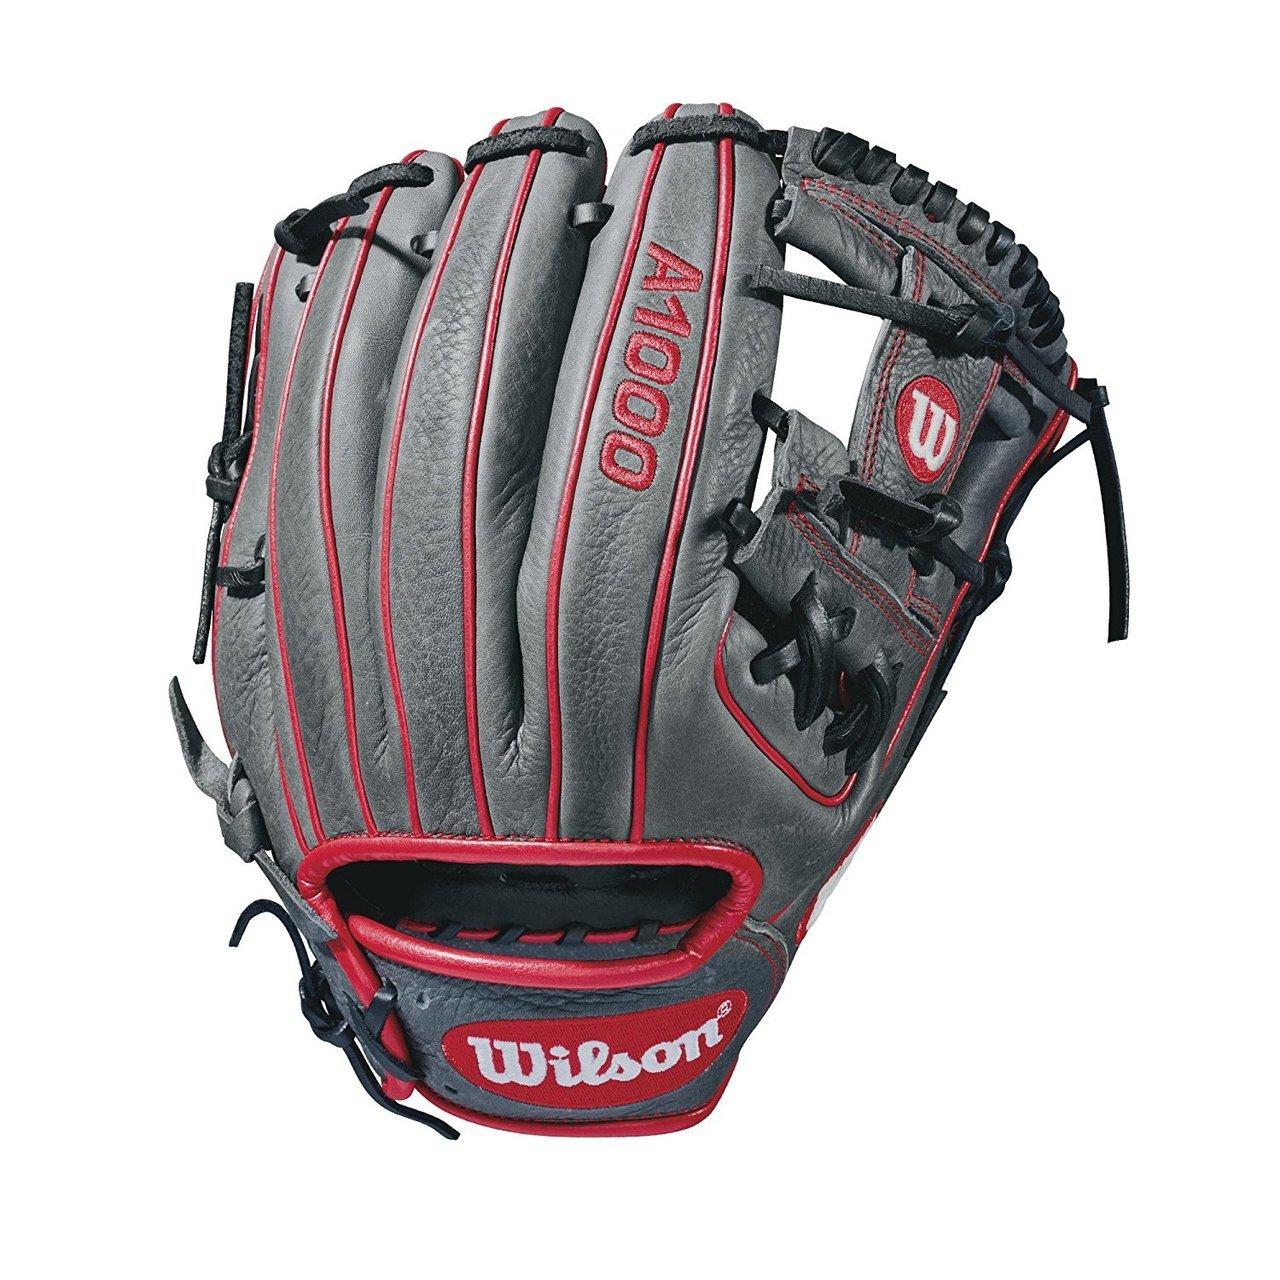 wilson glove a10rb191786